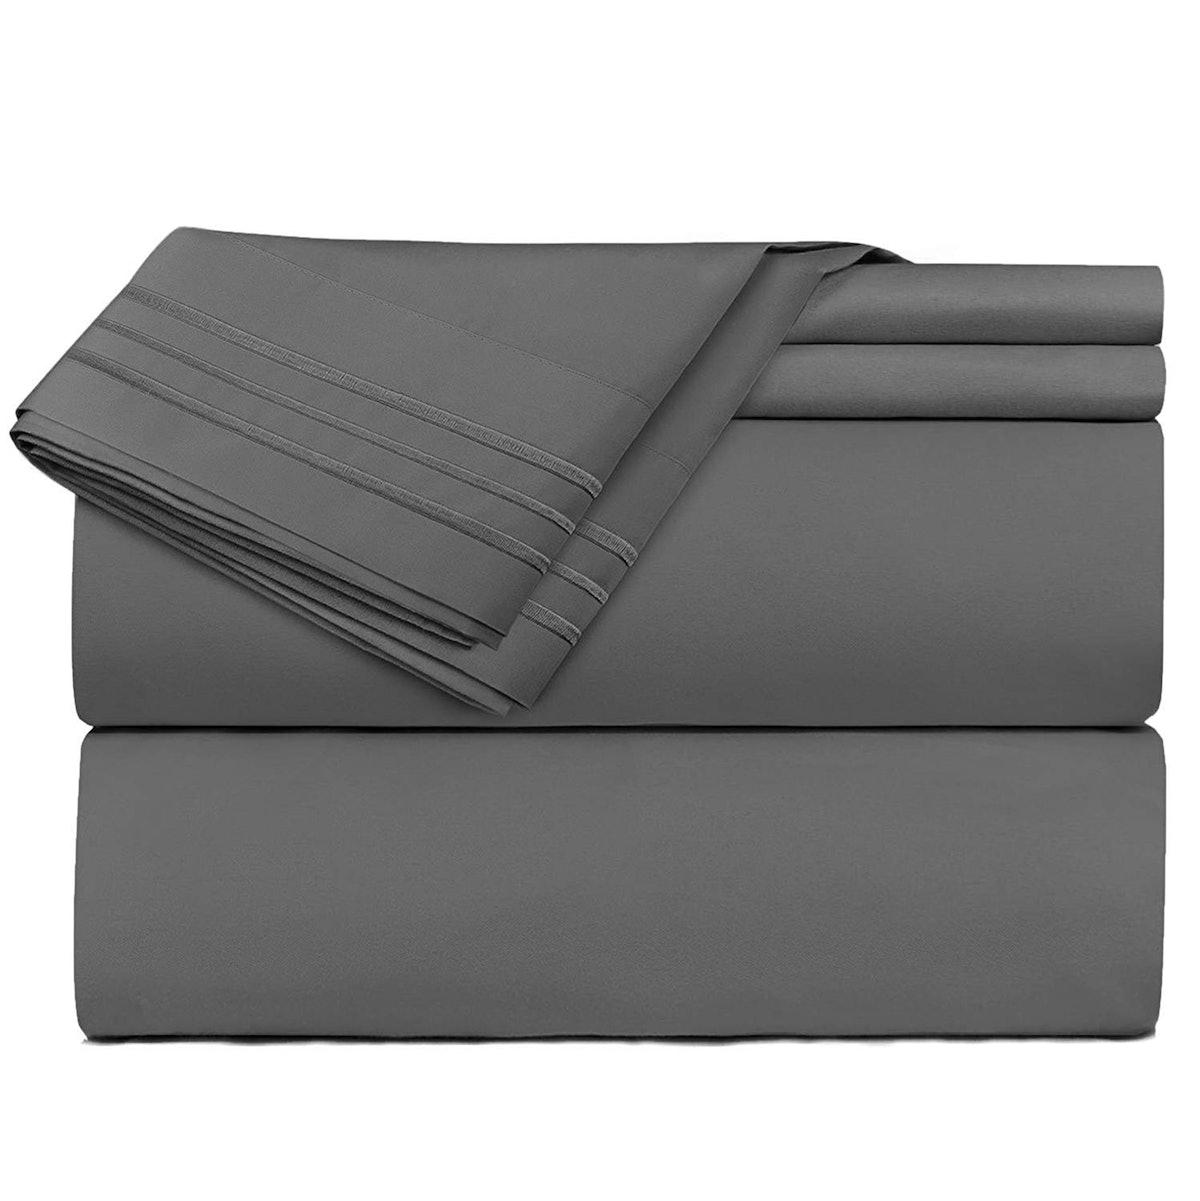 Nestl Bedding Sheet Set (Set of 4)